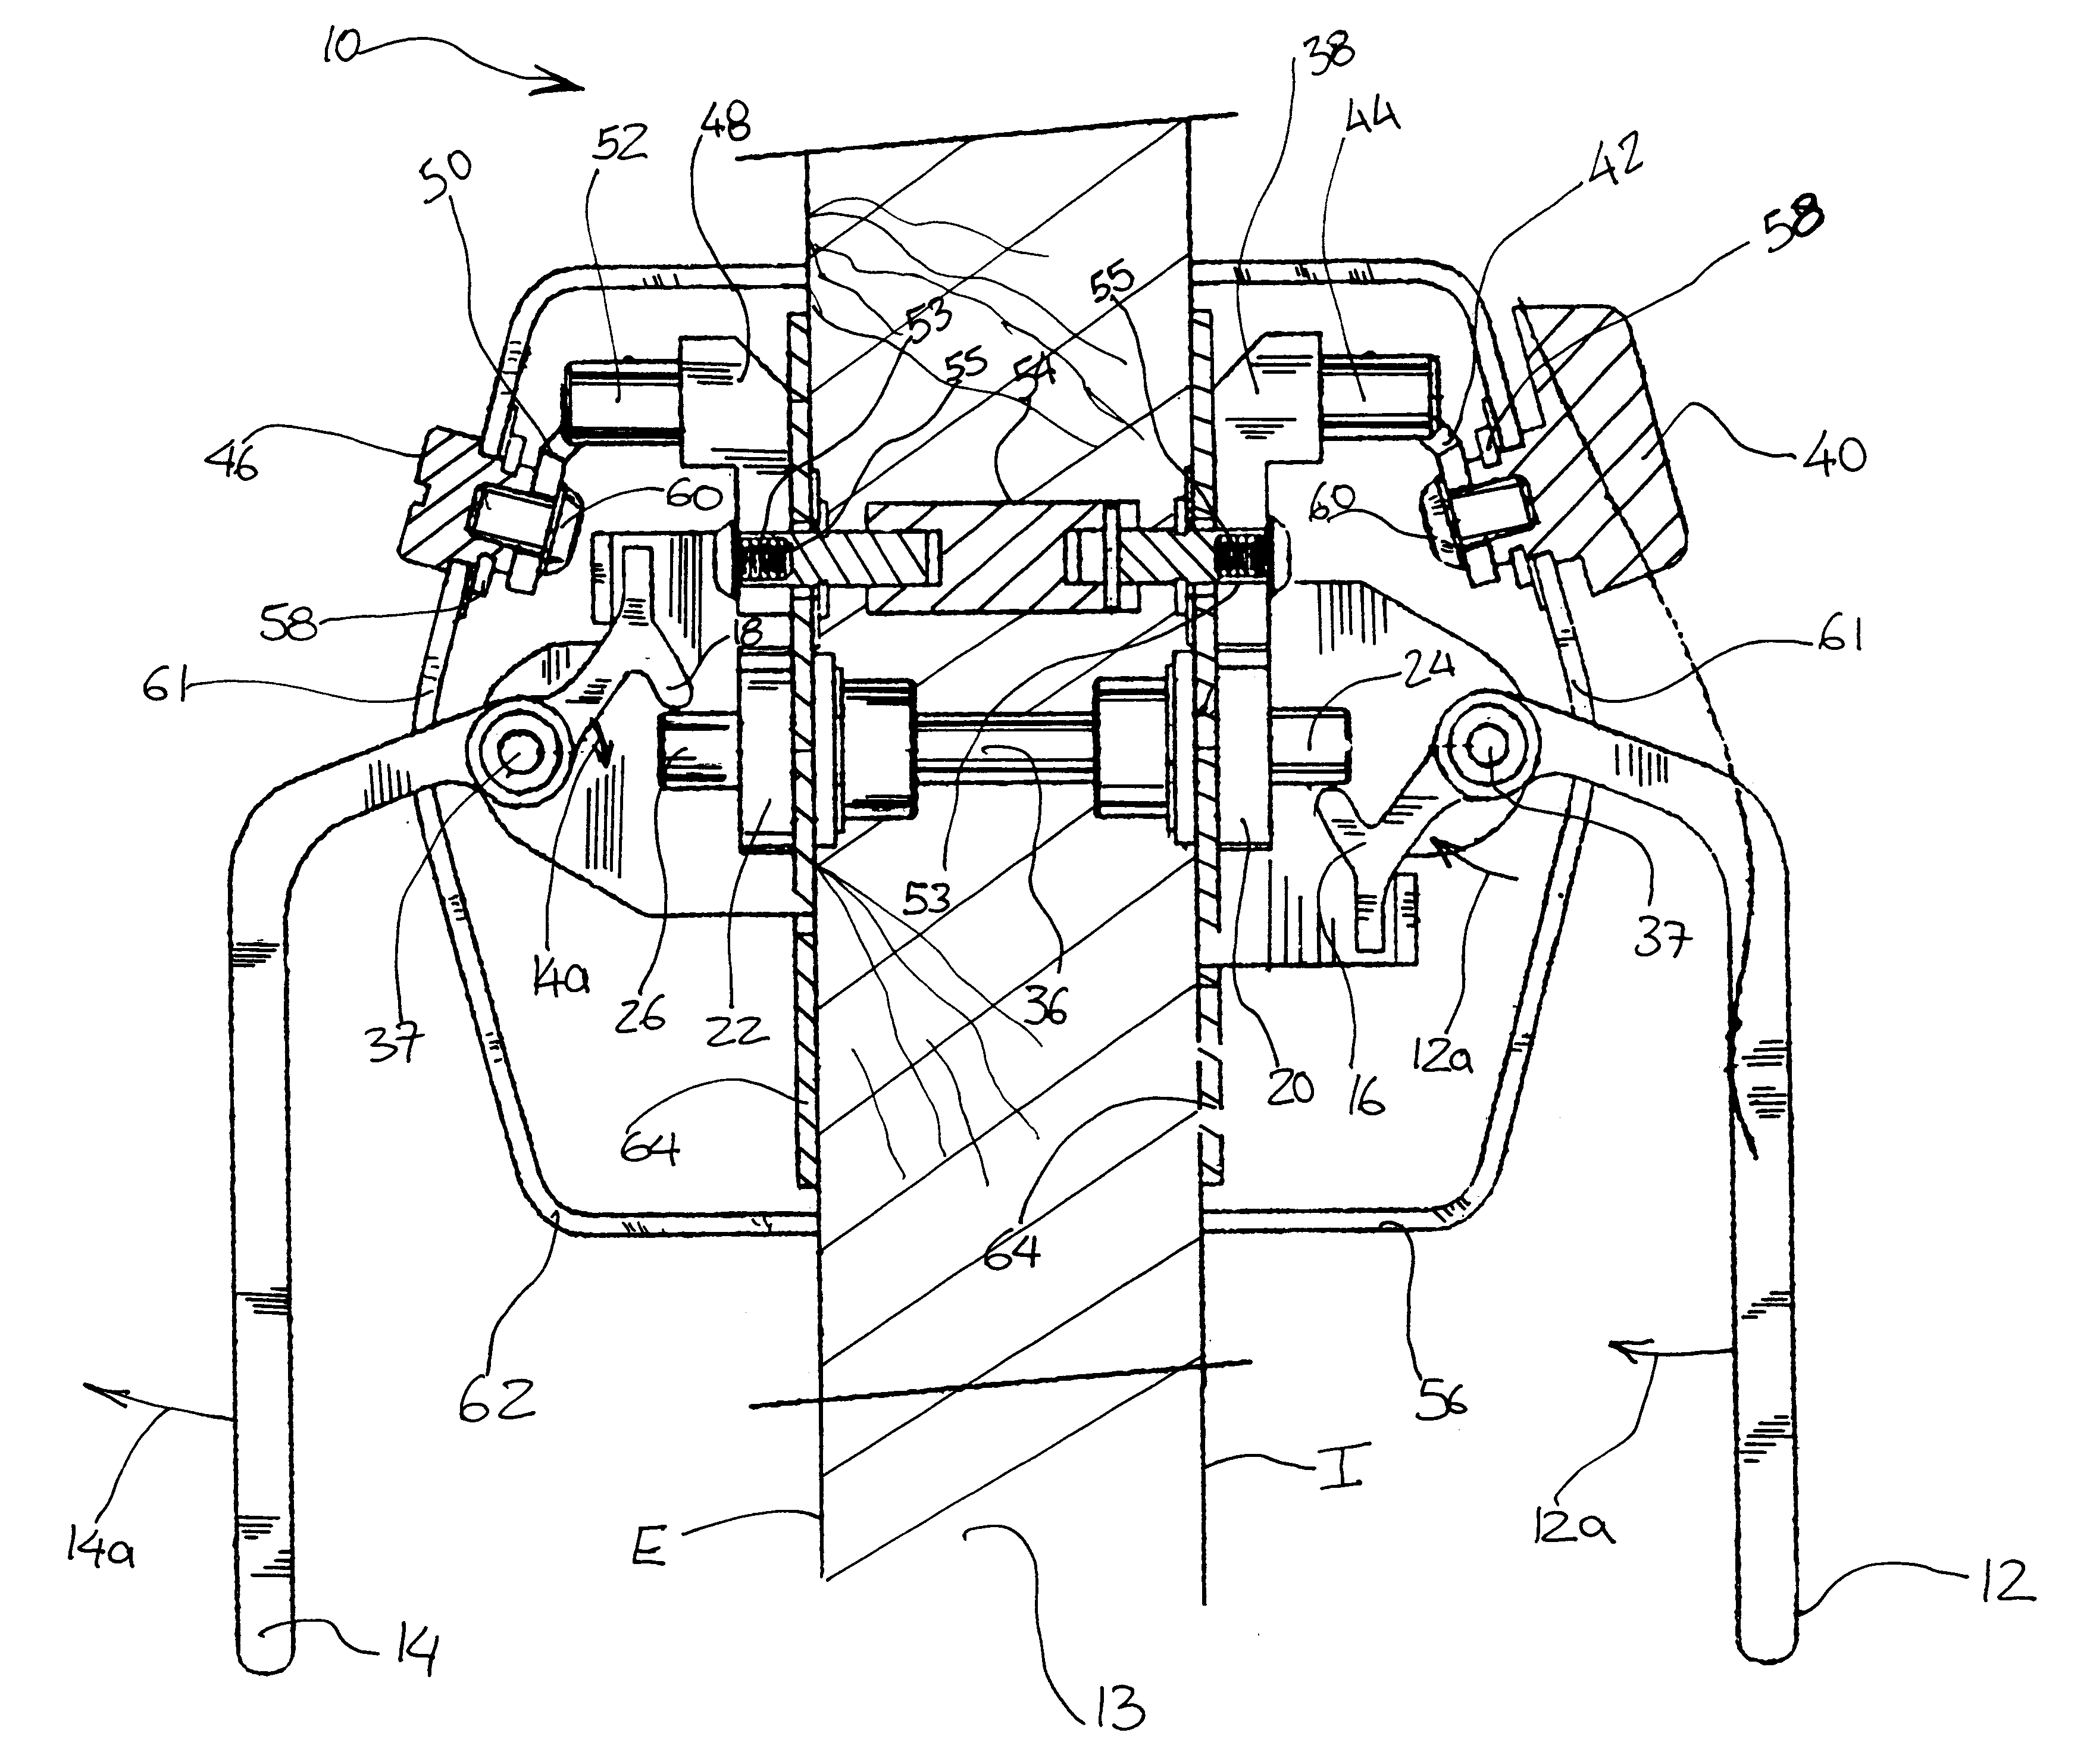 Nice 2004 Honda Odyssey Wiring Diagram Photo - The Wire - magnox.info